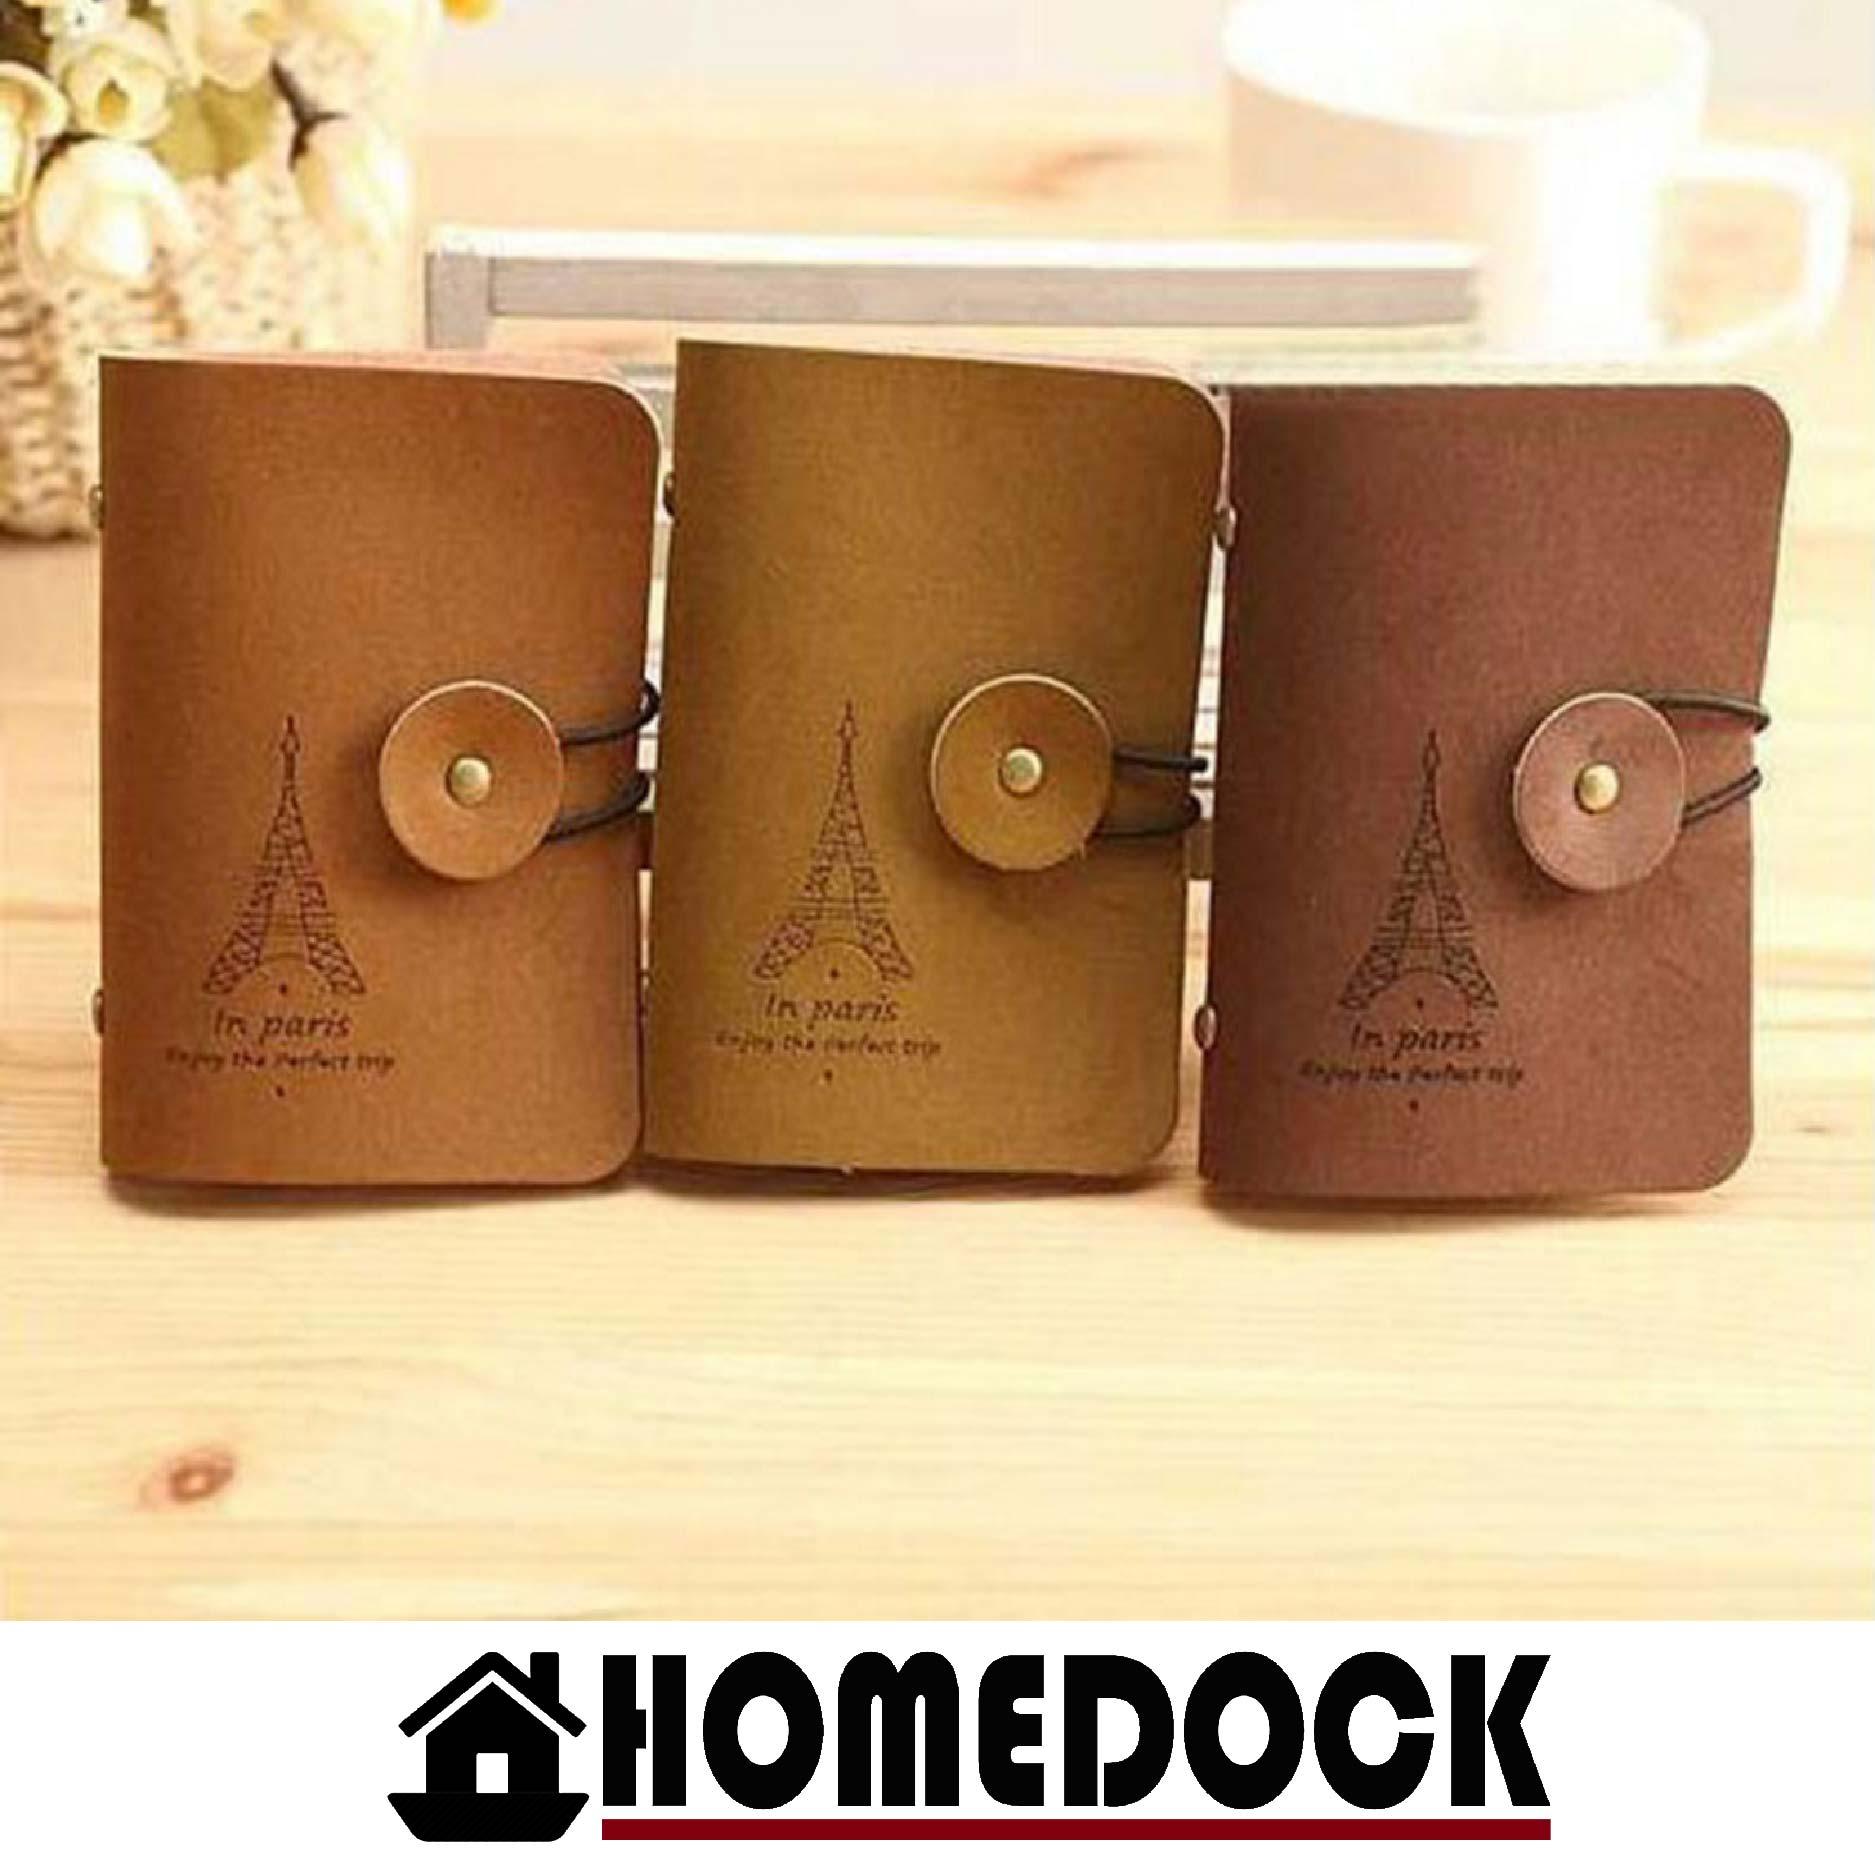 HOMEDOCK-復古風格絨皮卡片收納包  鈔票夾/車票夾/證件包/旅行收納/證件夾/車證/卡片包/卡片夾